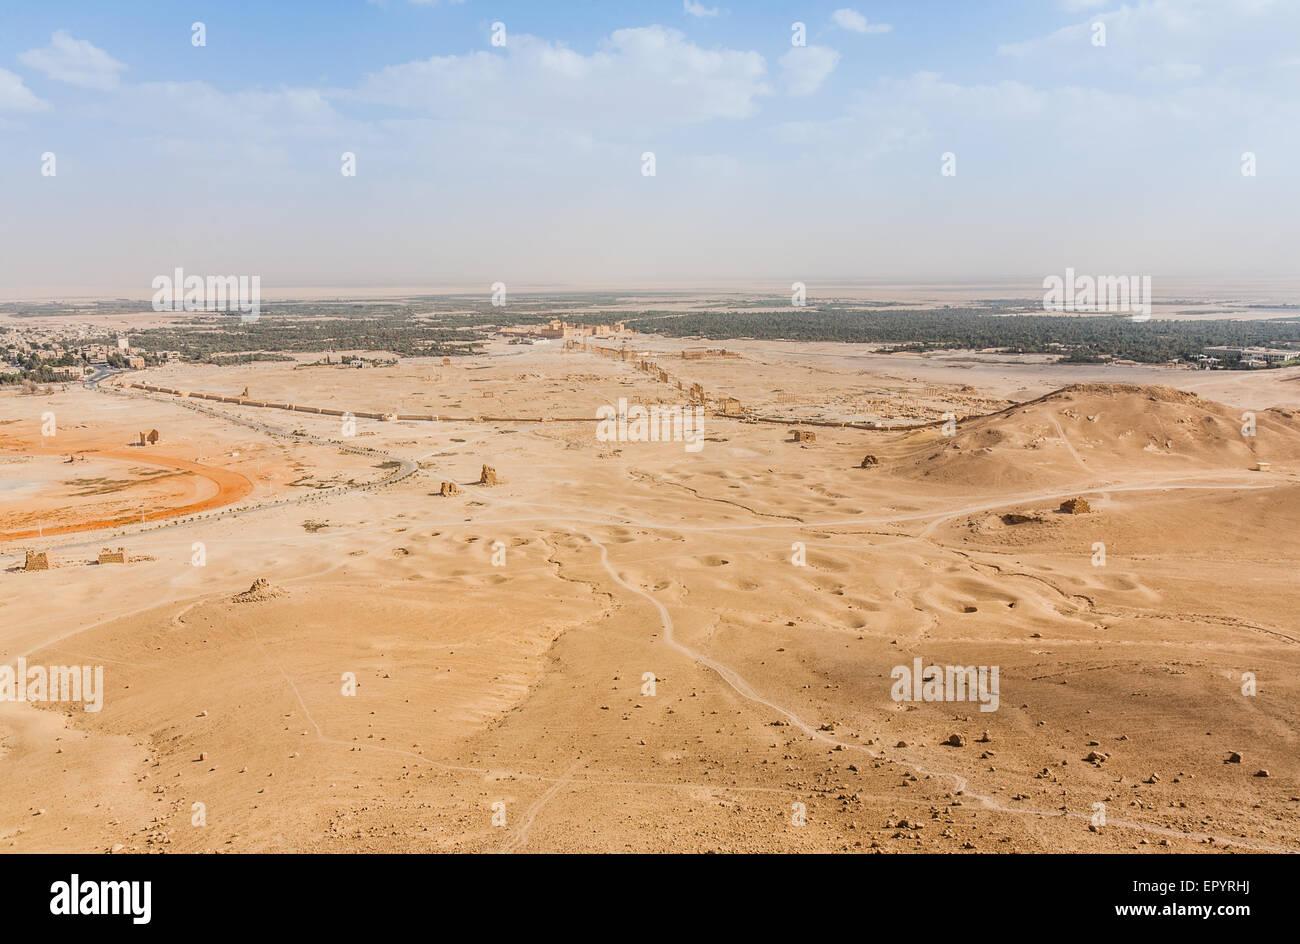 Palmyra as seen from Qal'at Ibn Maan - Stock Image